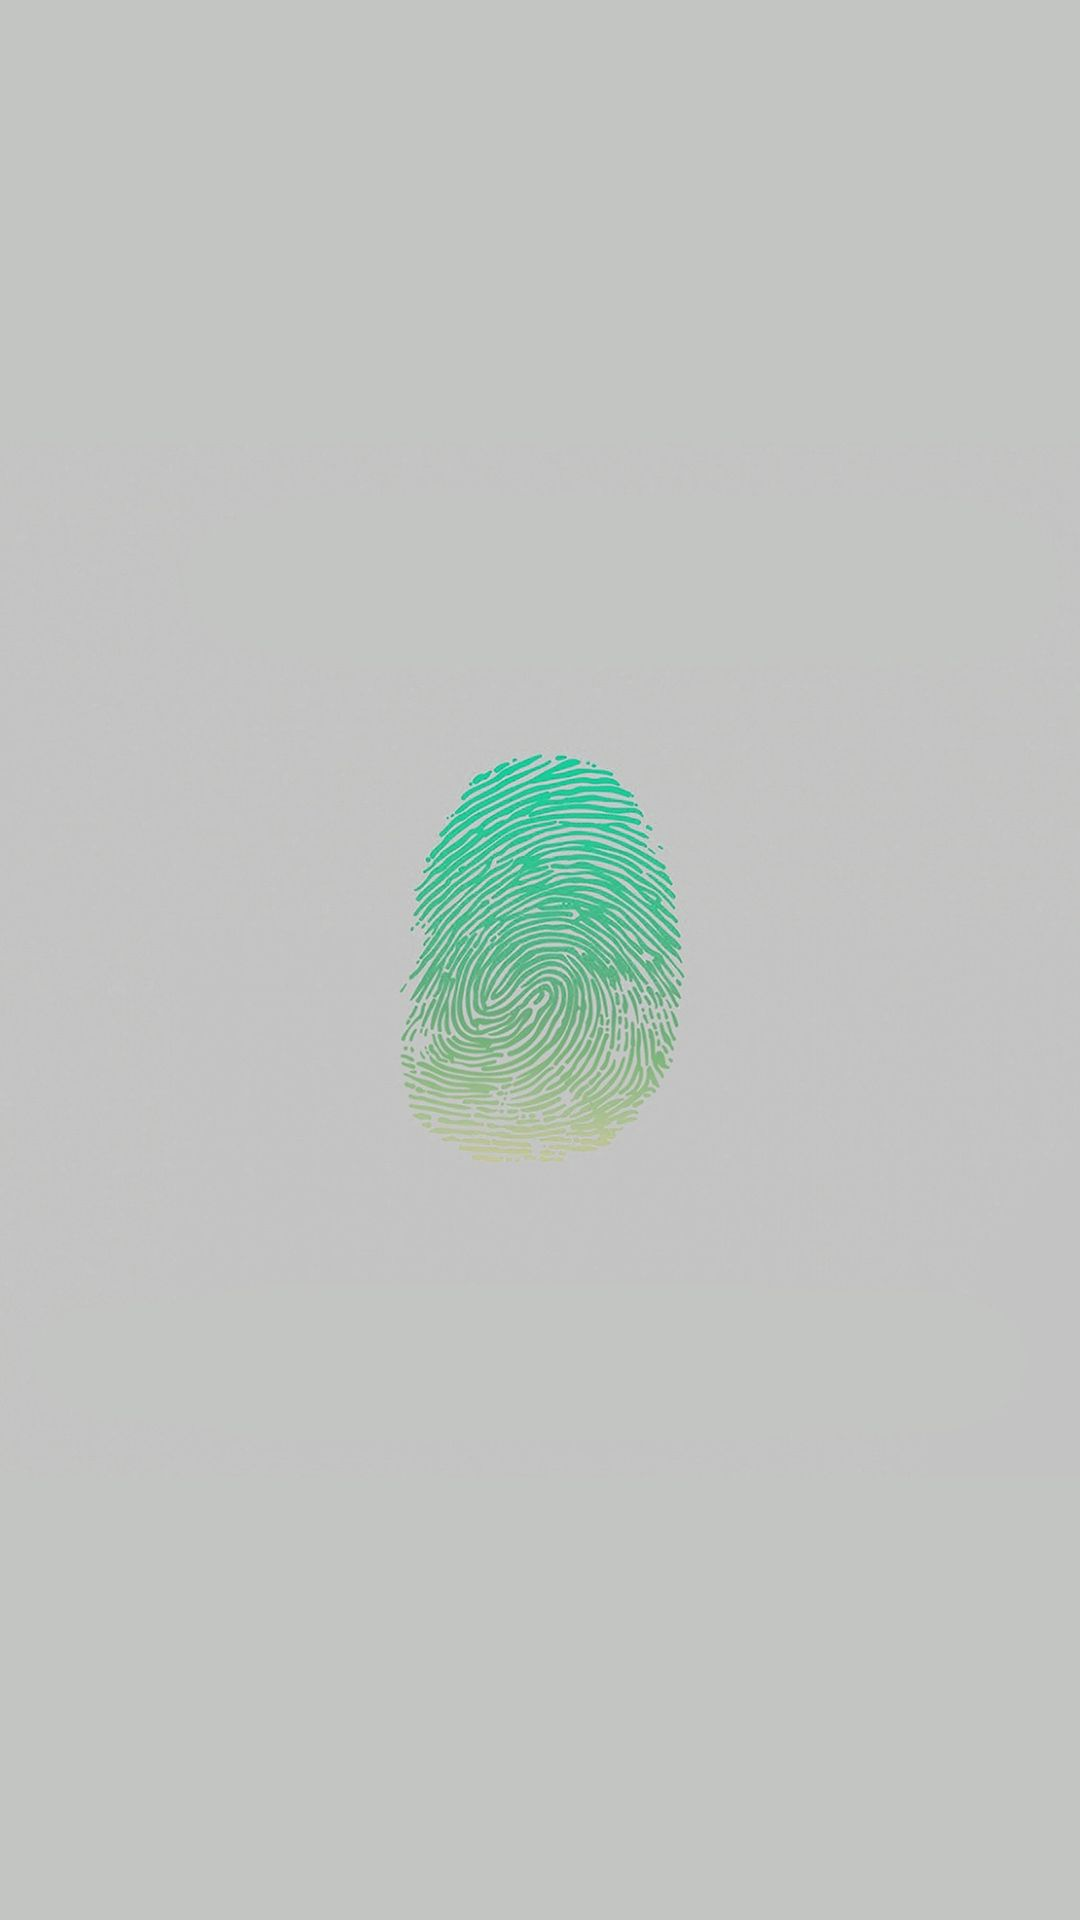 Drake Iphone 6 Wallpaper - Drawing - HD Wallpaper